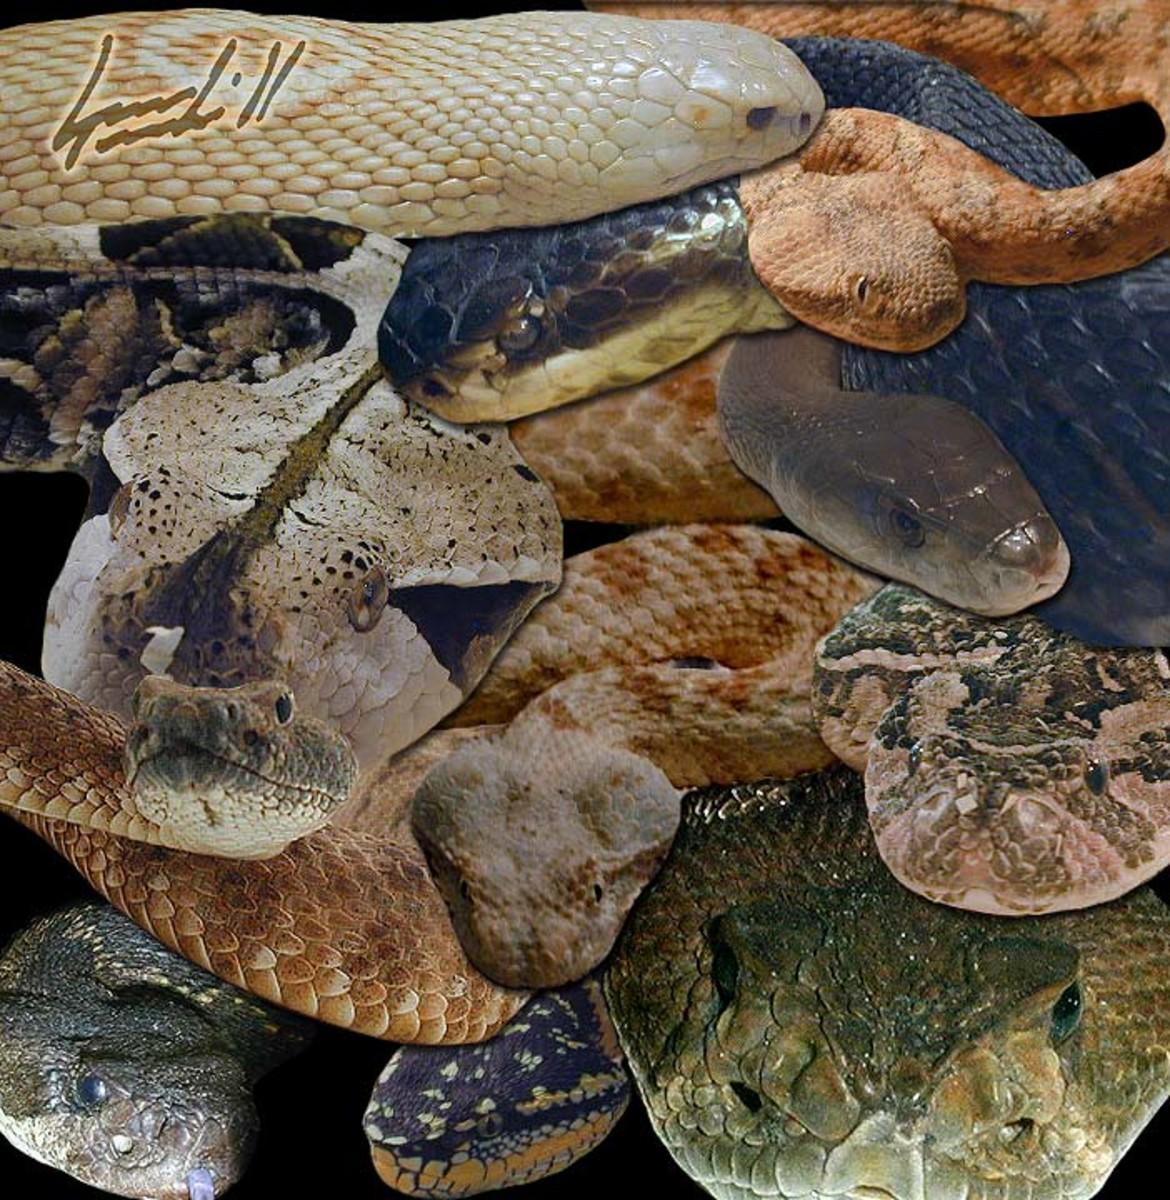 A collage of venomous snakes *copyright venomousreptiles.org